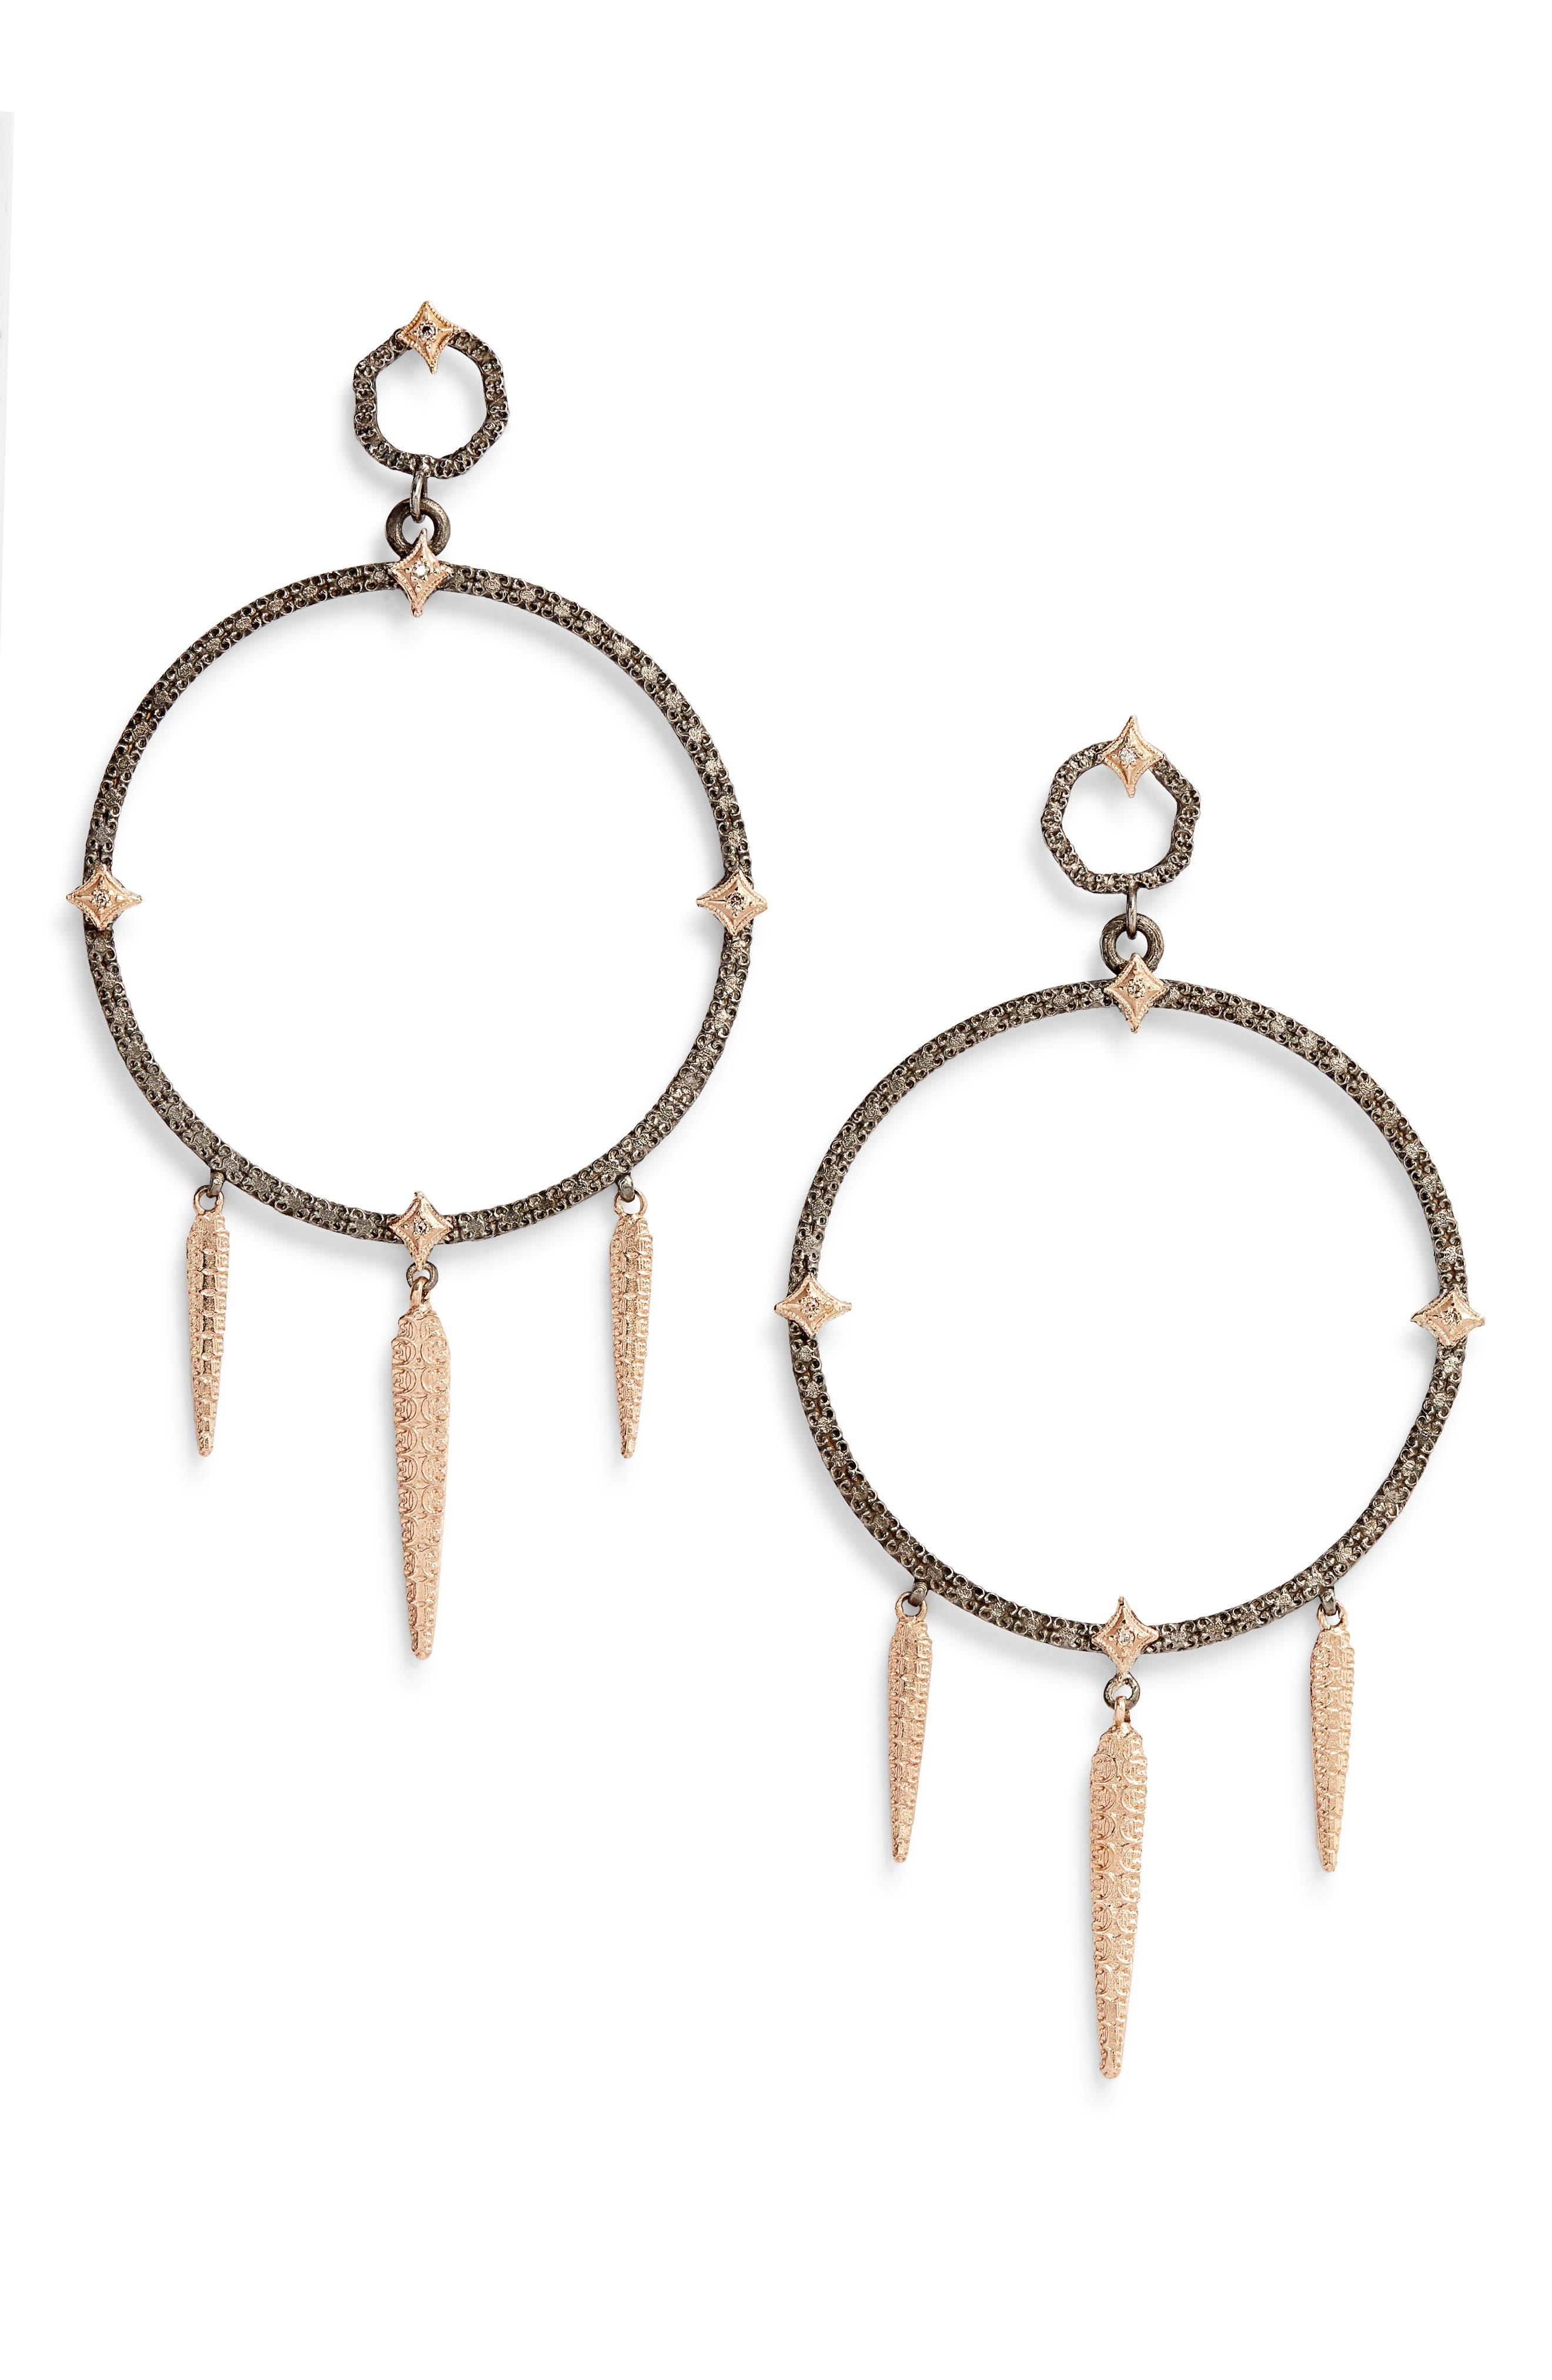 New World Large Circle Dagger Earrings,                             Main thumbnail 1, color,                             GOLD/ BLACKENED SILVER